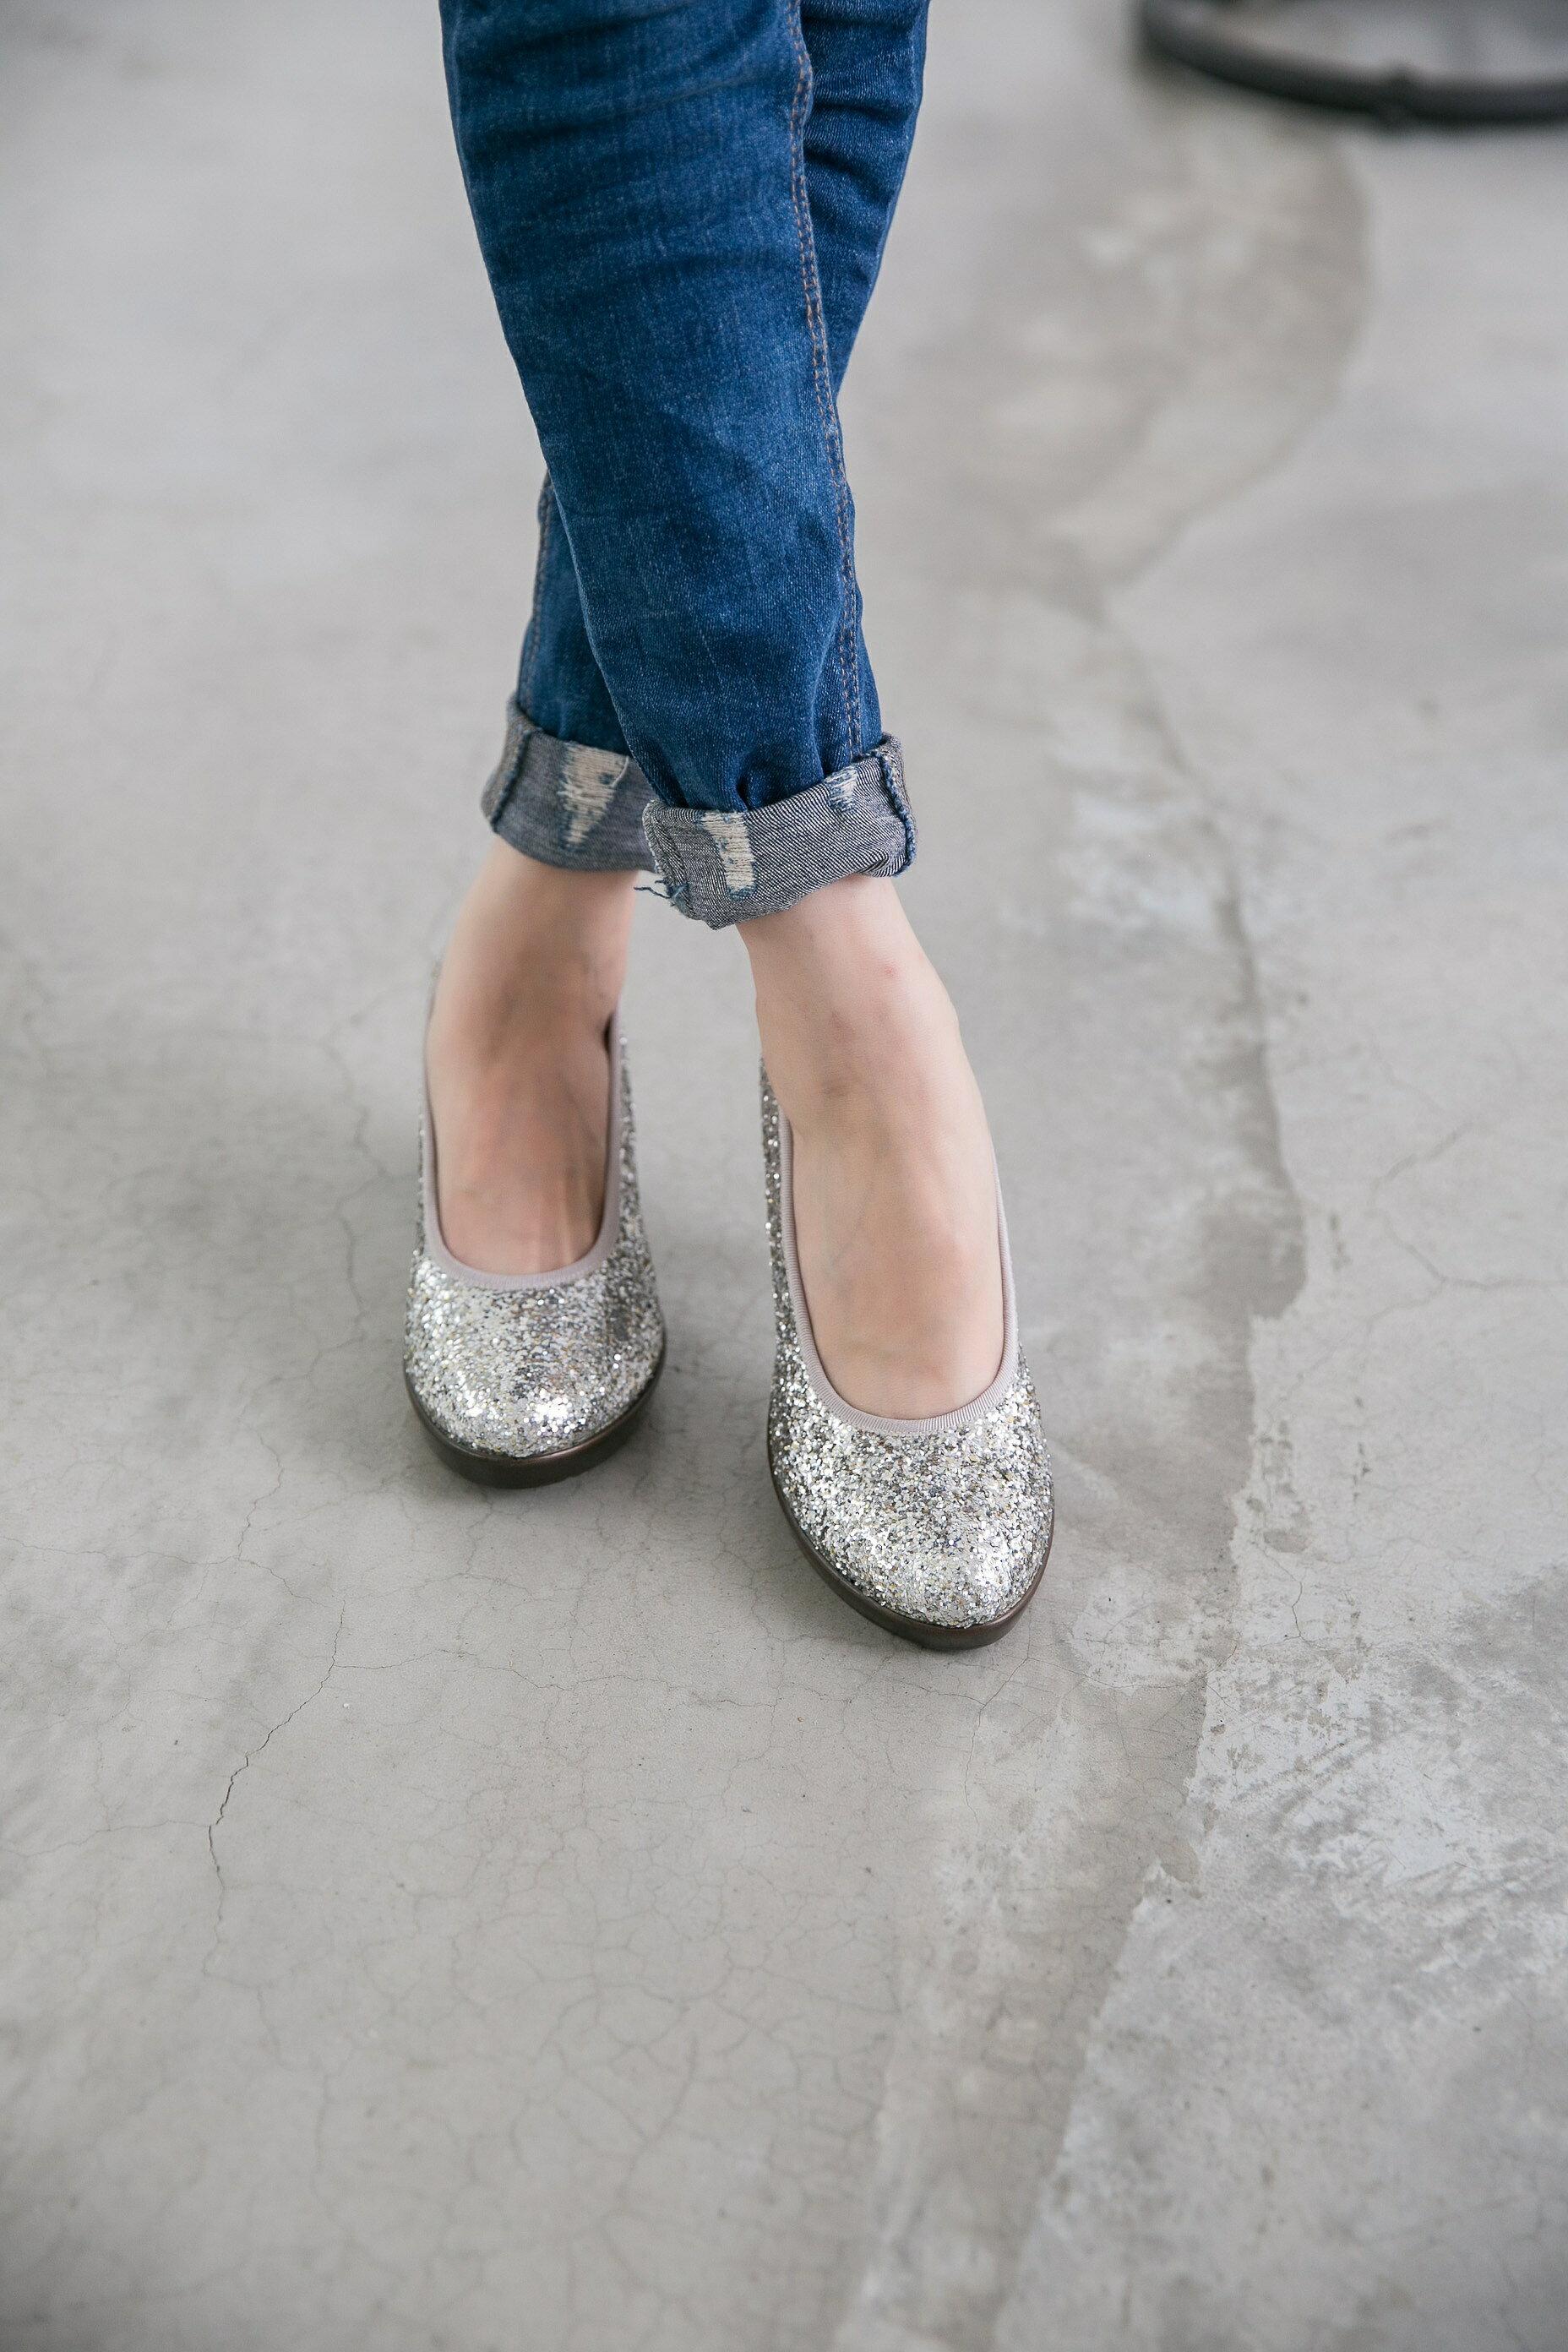 Aimez La Vie 舒適跟鞋|閃閃亮鑽約會Party厚底中跟鞋 2